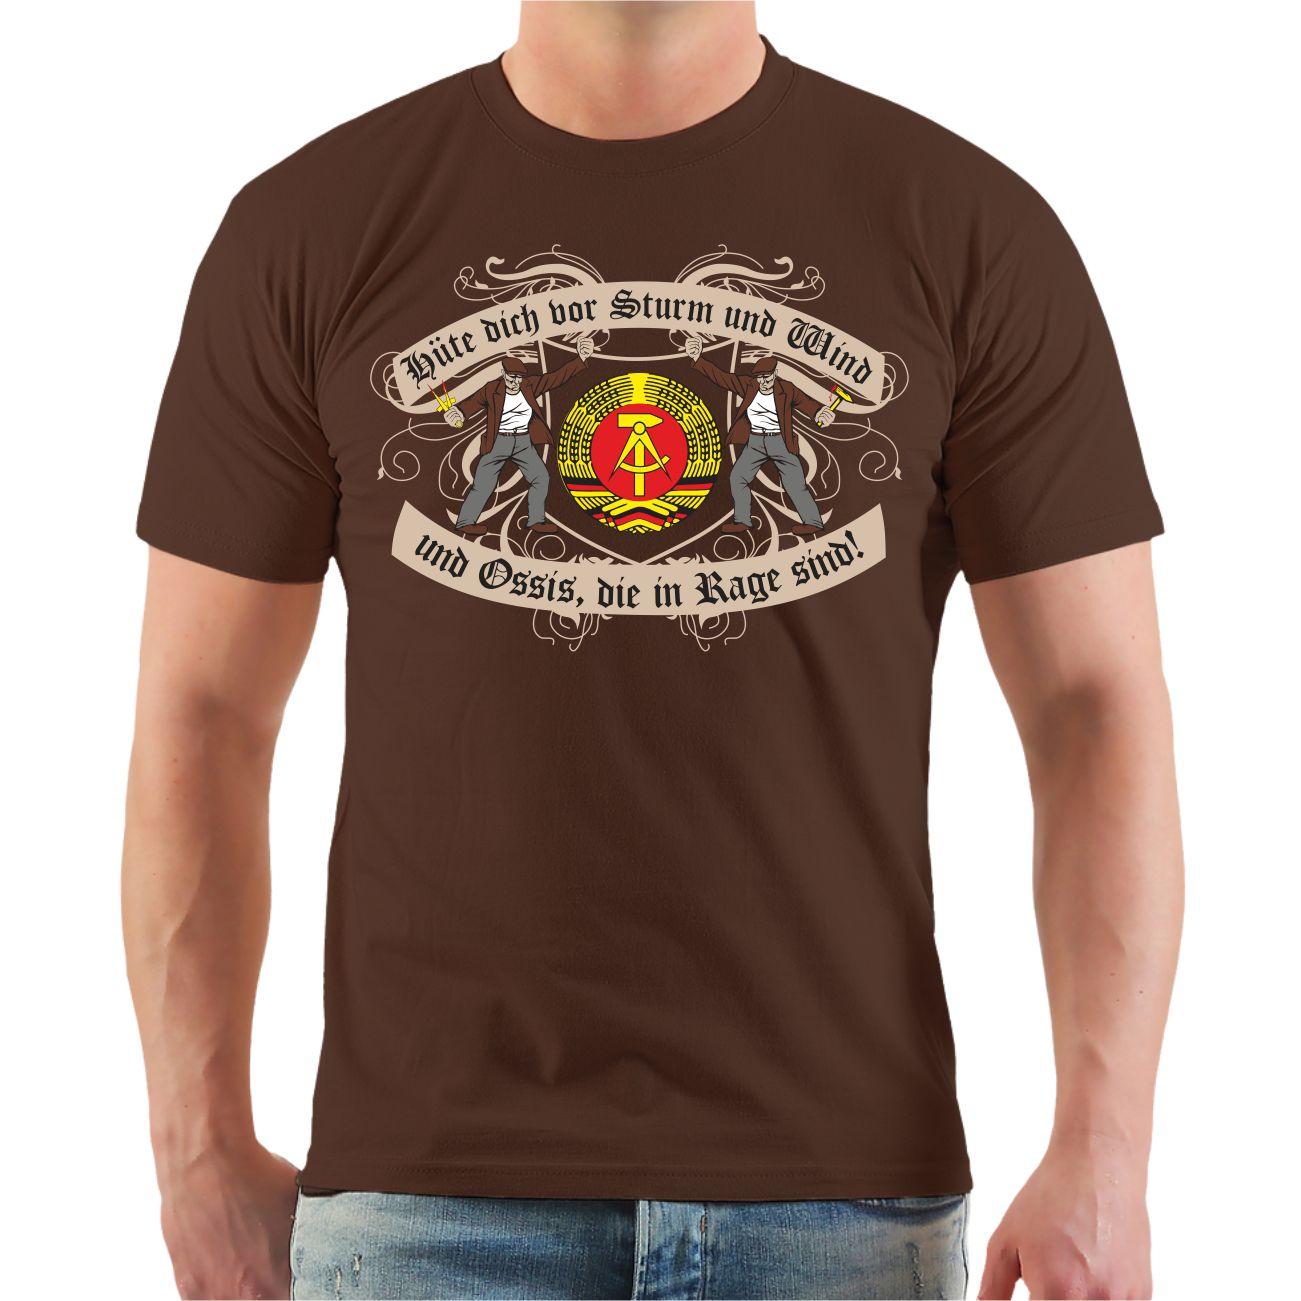 Full Size of Geschwister Sprüche T Shirt Lustige Sprüche T Shirt Männer Walter Röhrl Sprüche T Shirt Familie Ritter Sprüche T Shirt Küche Sprüche T Shirt